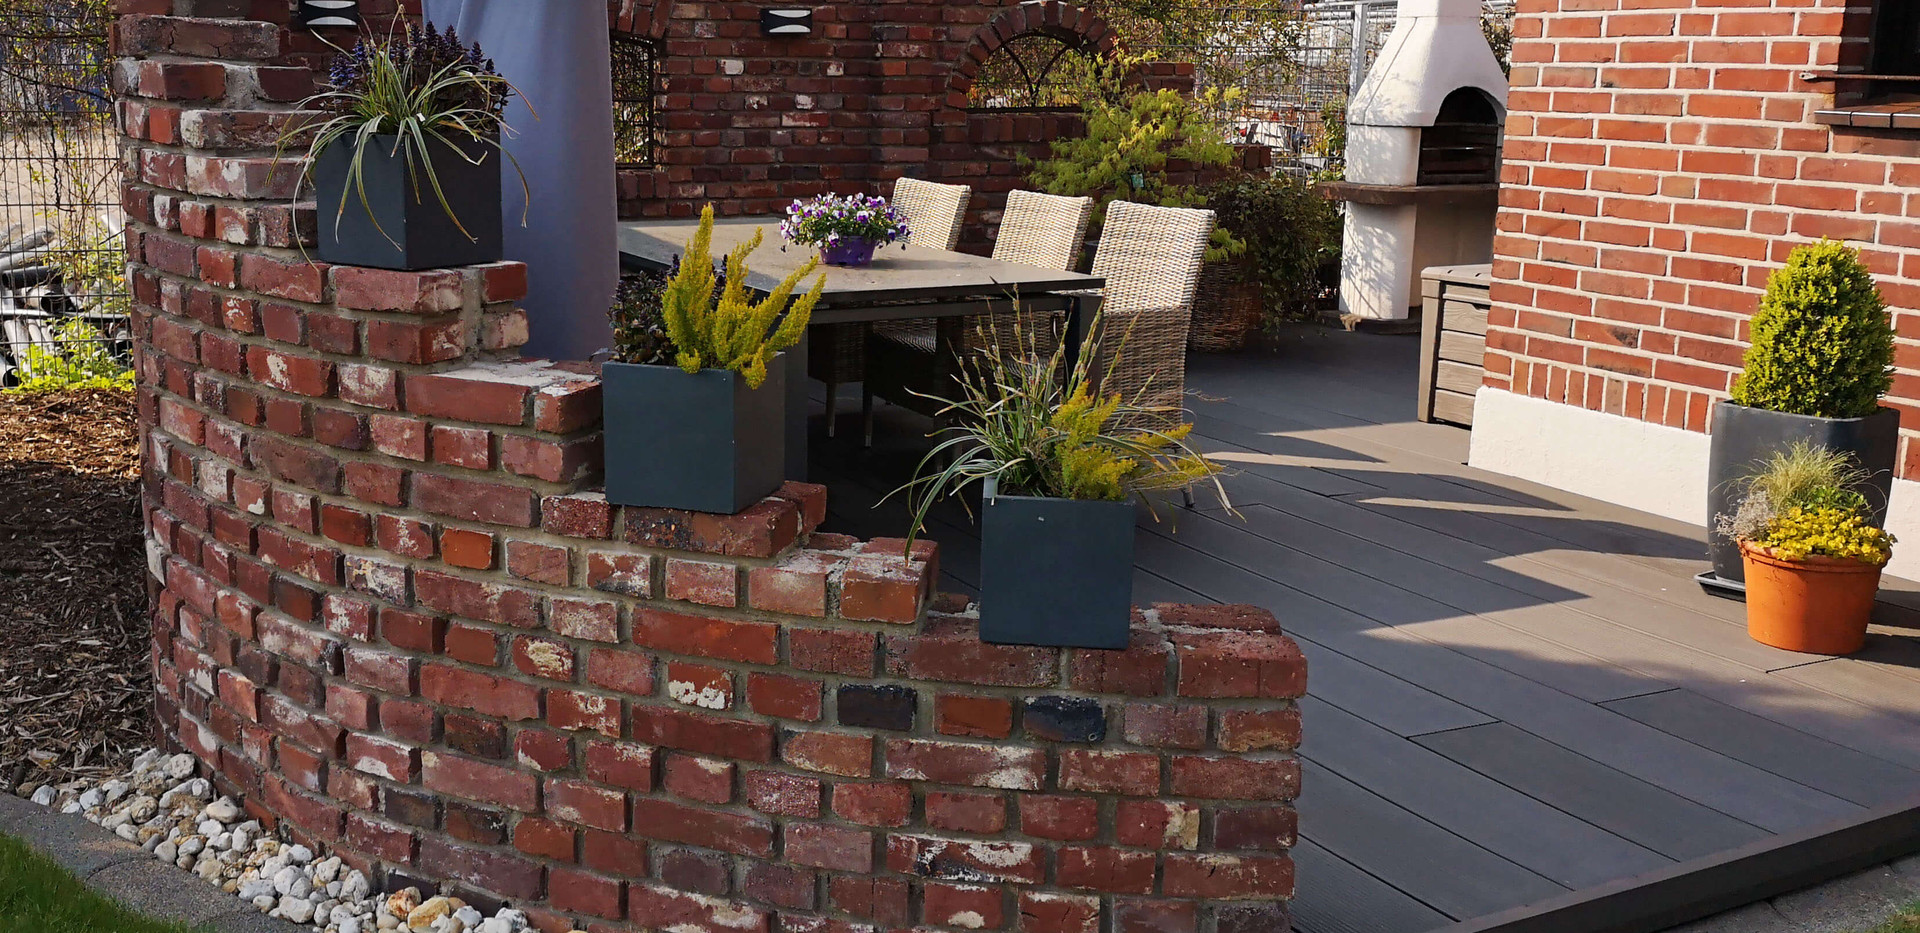 Gemauerte Gartenmauer